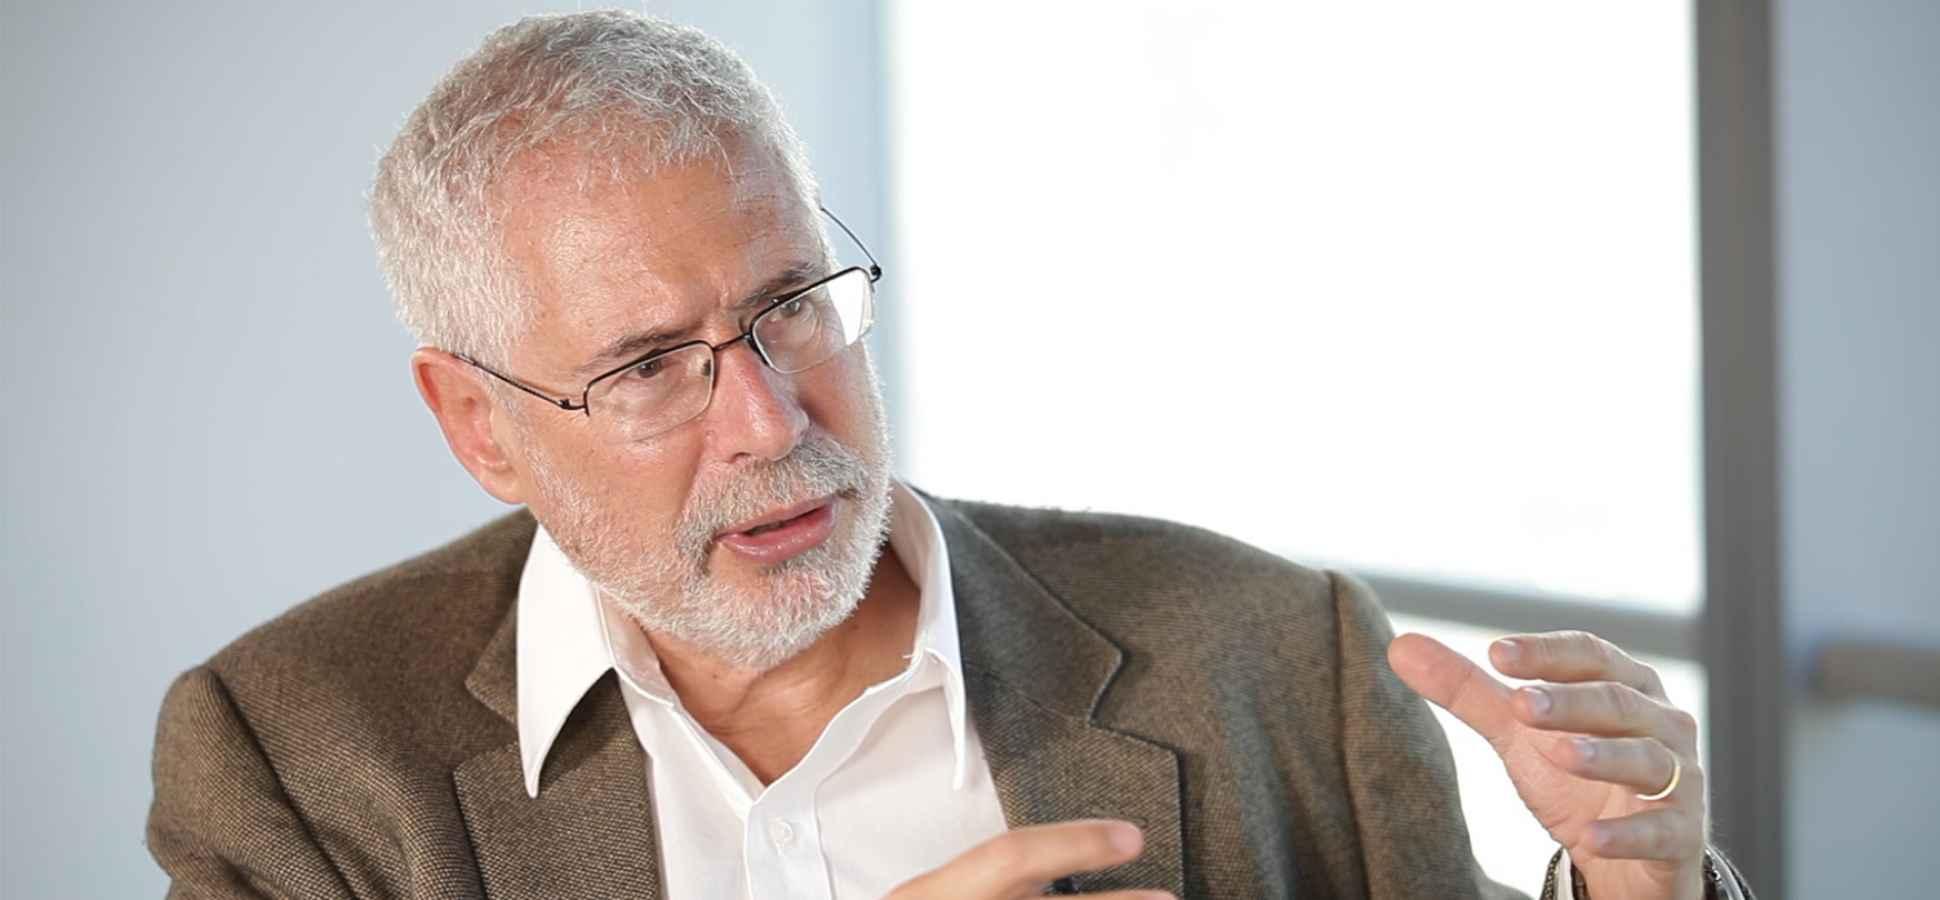 Steve Blank on What's Next for Lean Startups